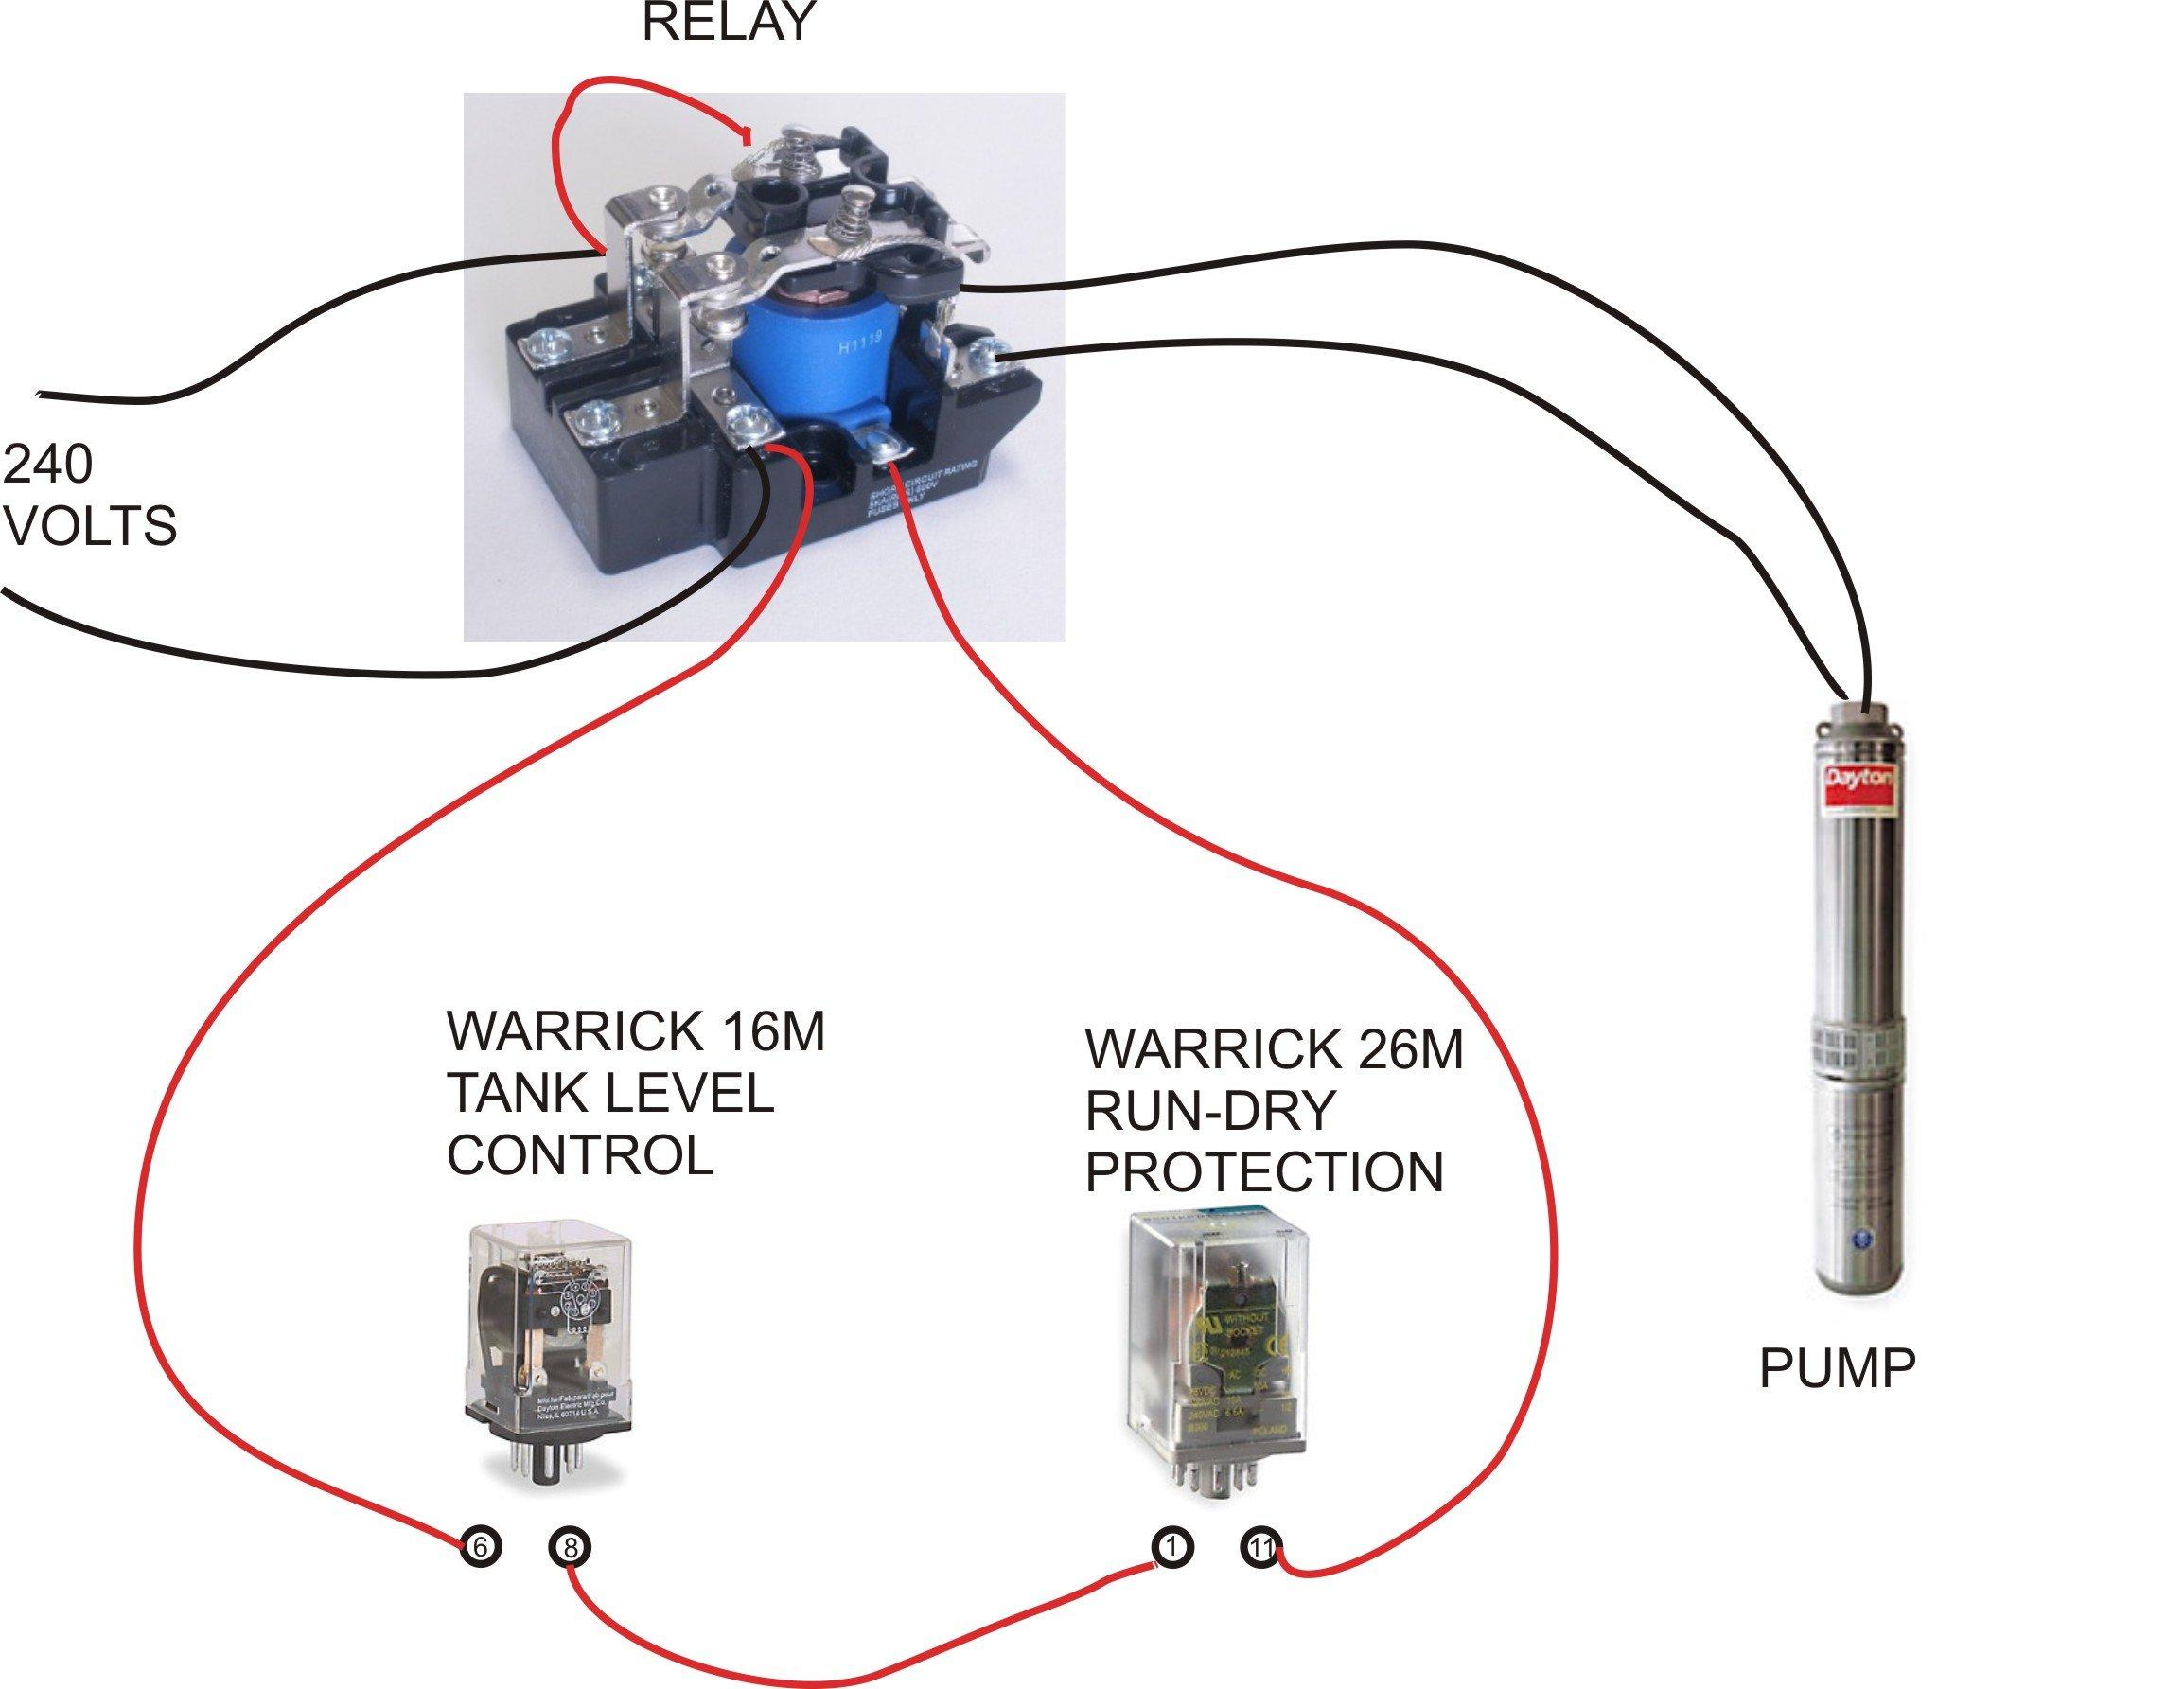 Warrick Controls Wiring Diagram